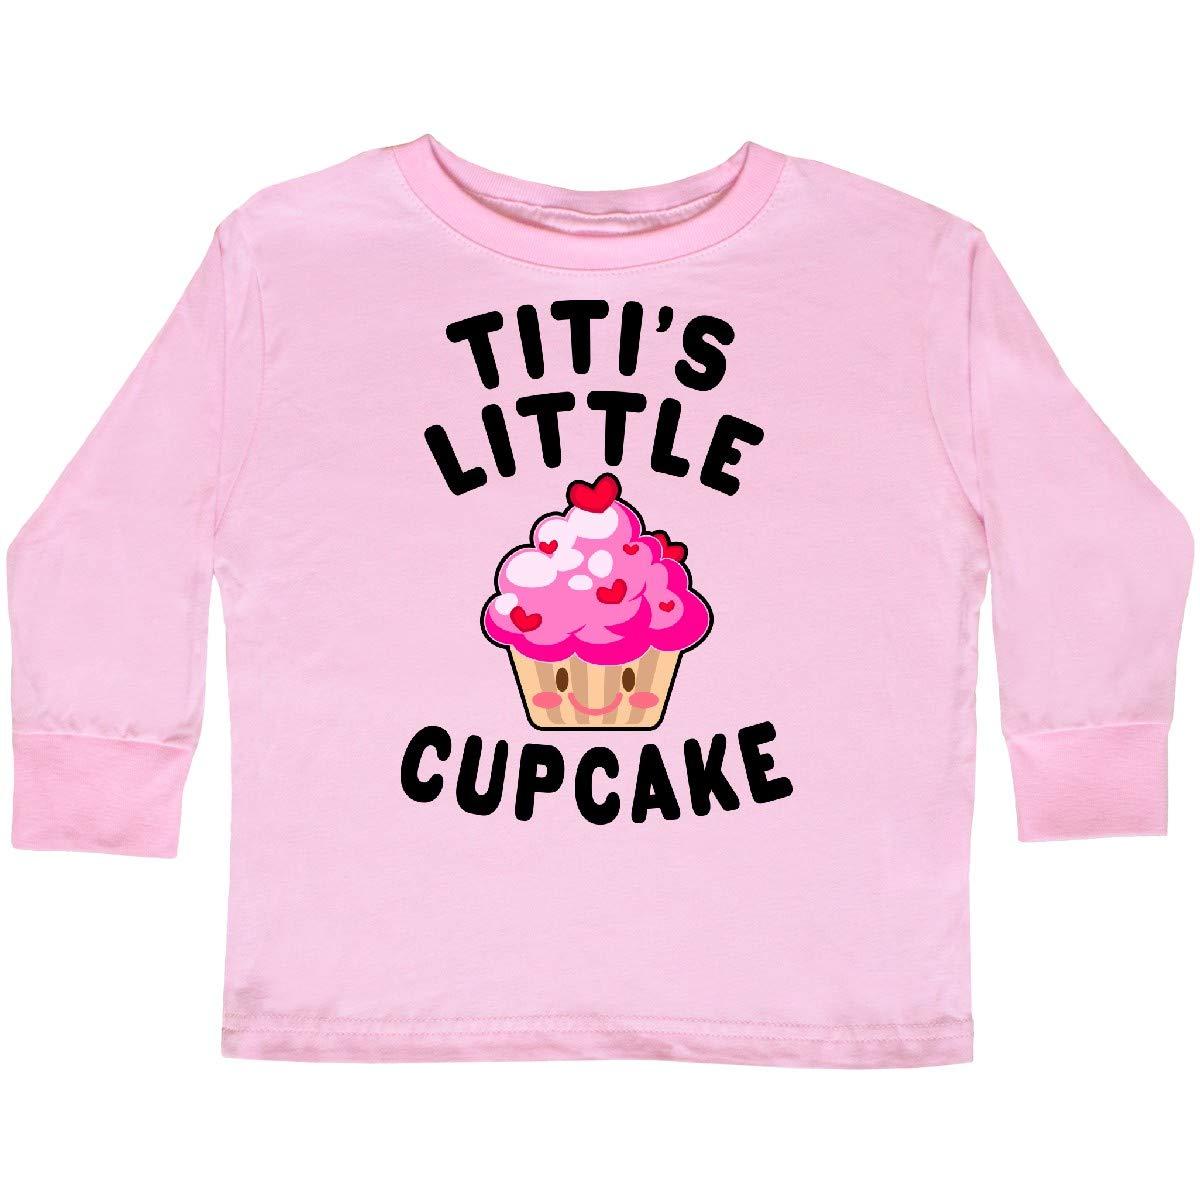 inktastic Titis Little Cupcake Toddler Long Sleeve T-Shirt